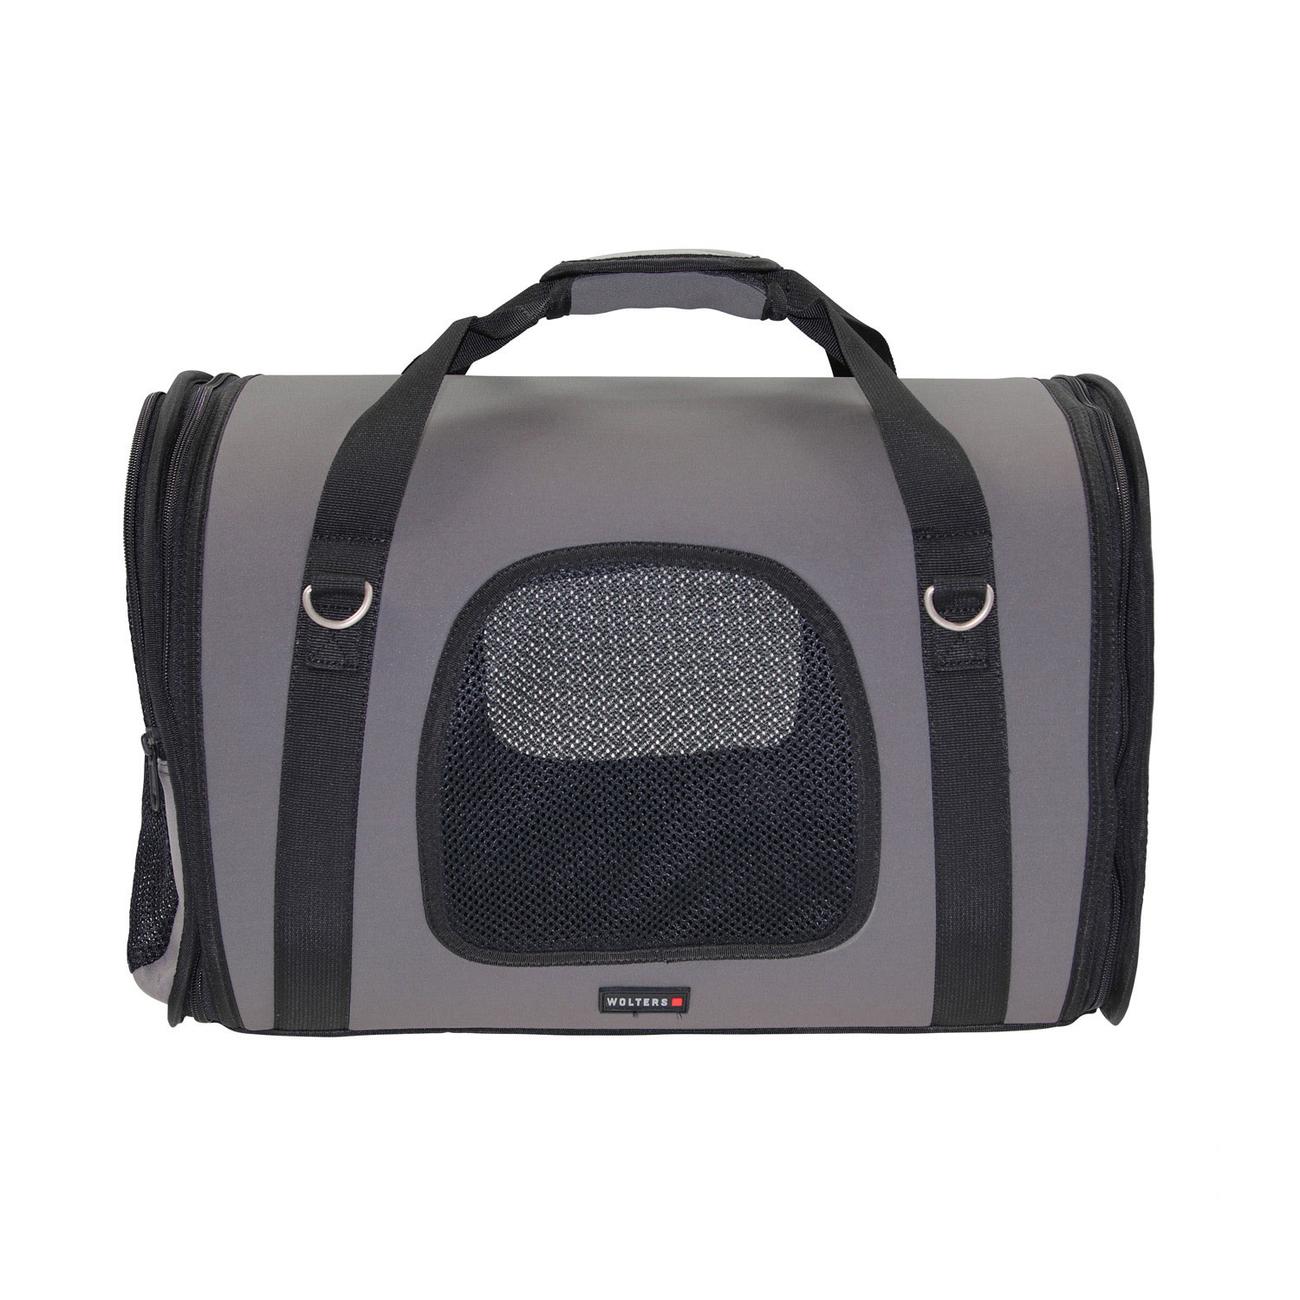 Wolters Hundetragetasche Sport-Carrier Grey Essentials